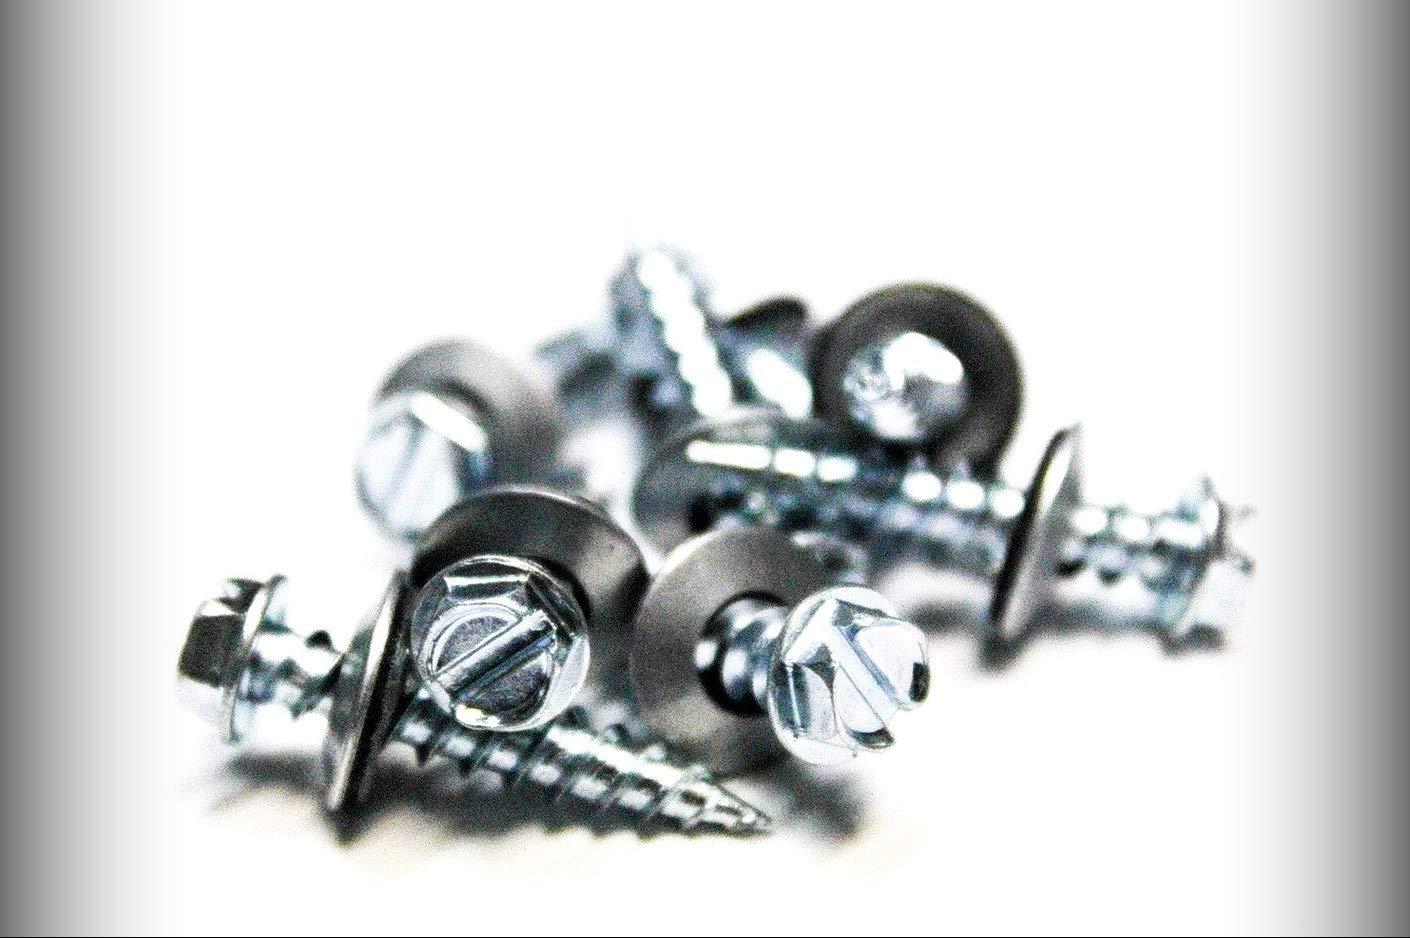 New Package of 100 Set #TR-0685F Warranity by Pr-Mch pcs 10 x 1 Hex Head Sheet Metal Screws Neoprene Washer Roofing Screws